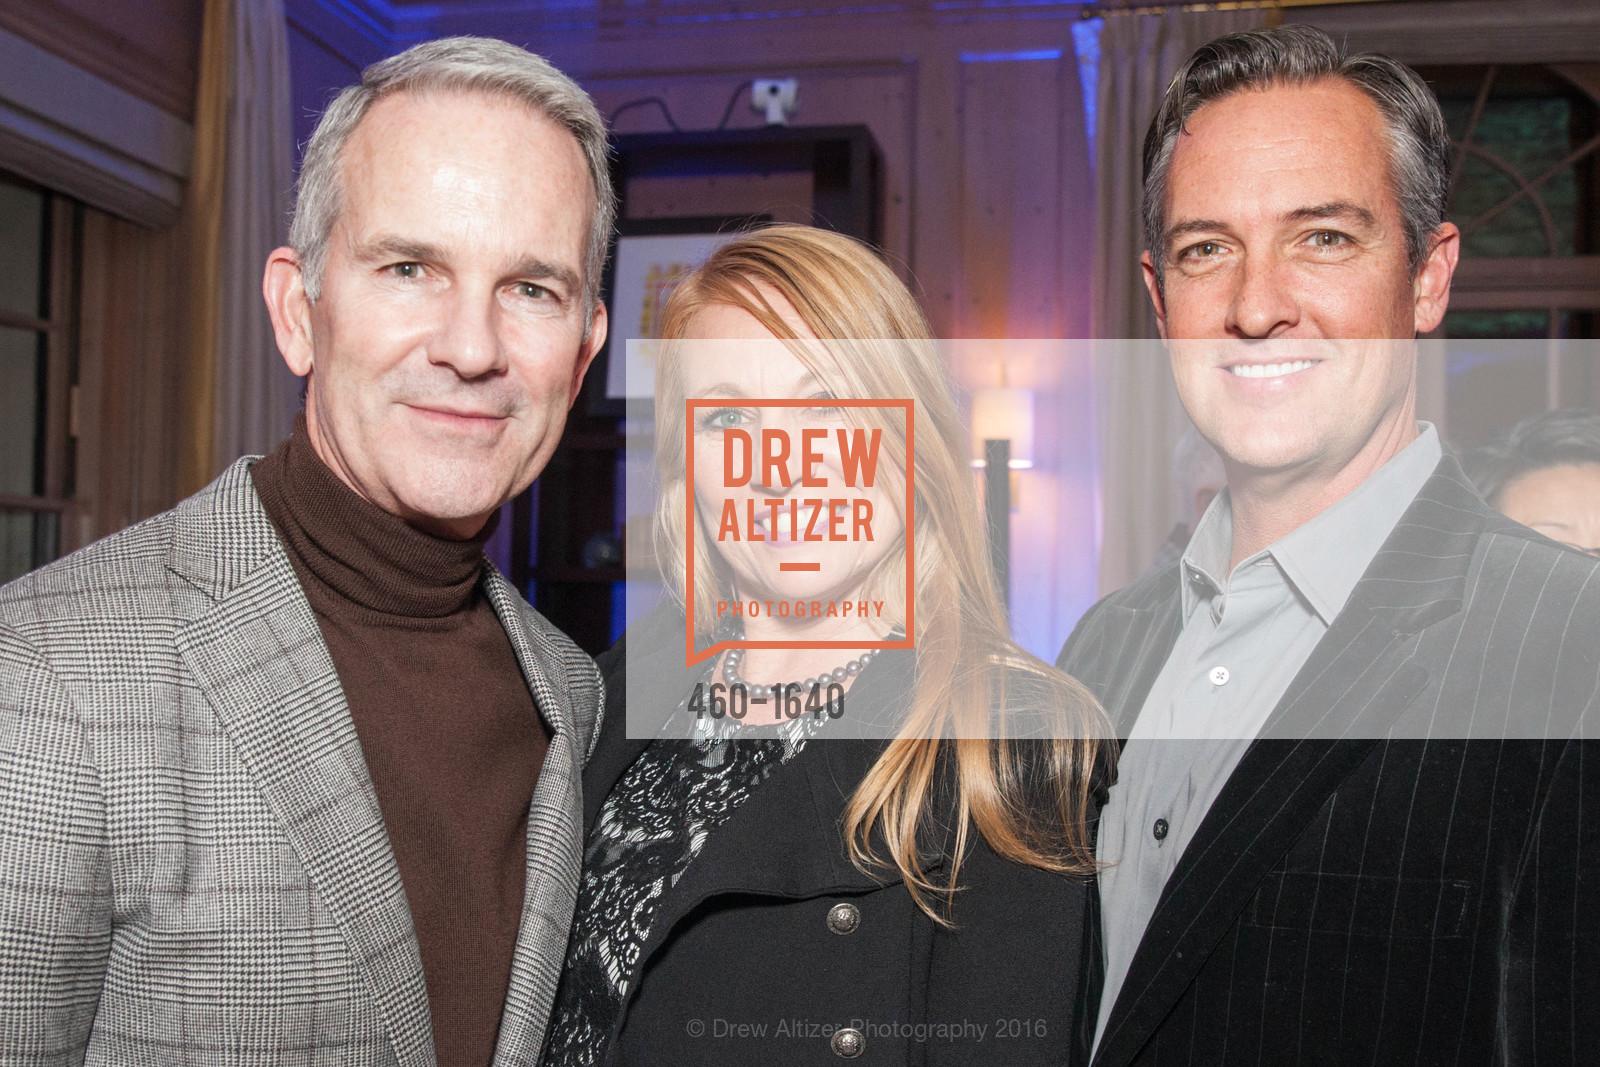 Jeffrey Gibson, Emma Schultz, Shen Schultz, Gregg Lynn and Glenn Risso's Engagement Party, Farimont Hotel, Penthouse. San Francisco, California, December 7th, 2016